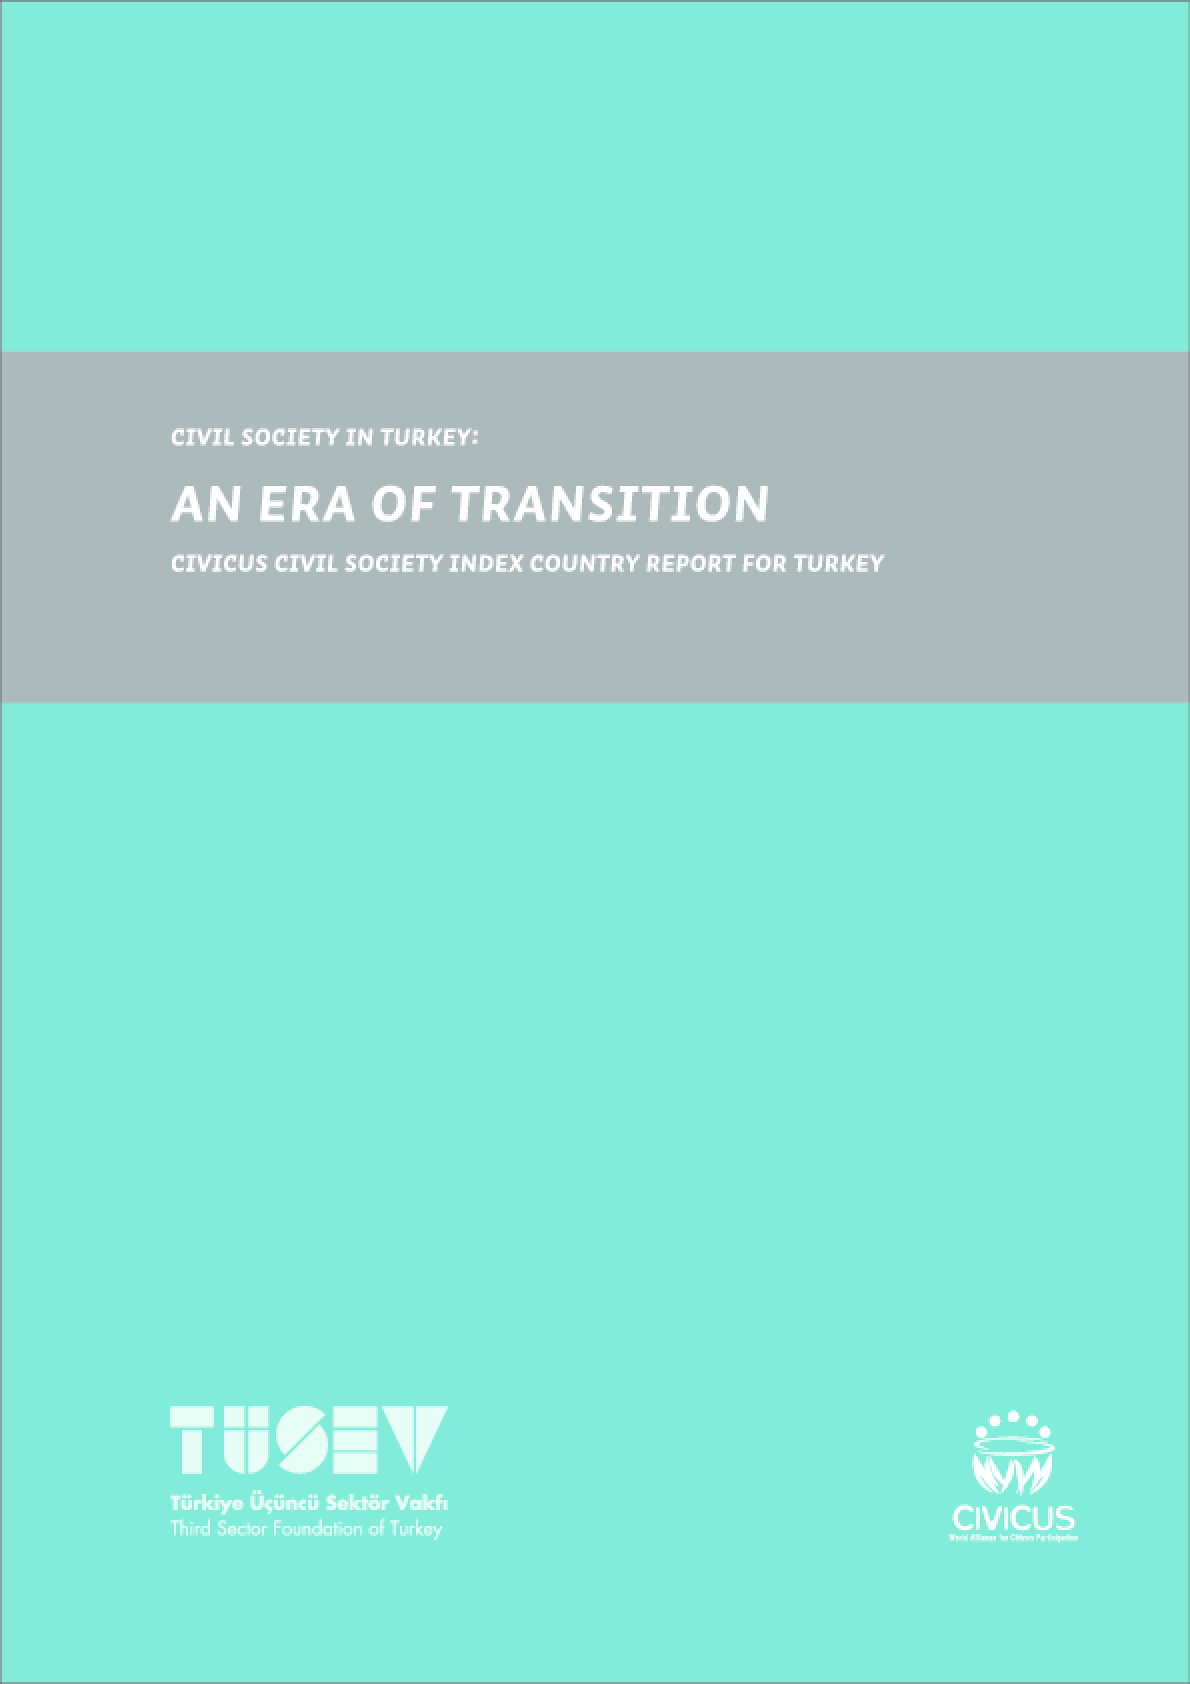 Civil Society in Turkey: An Era of Transition